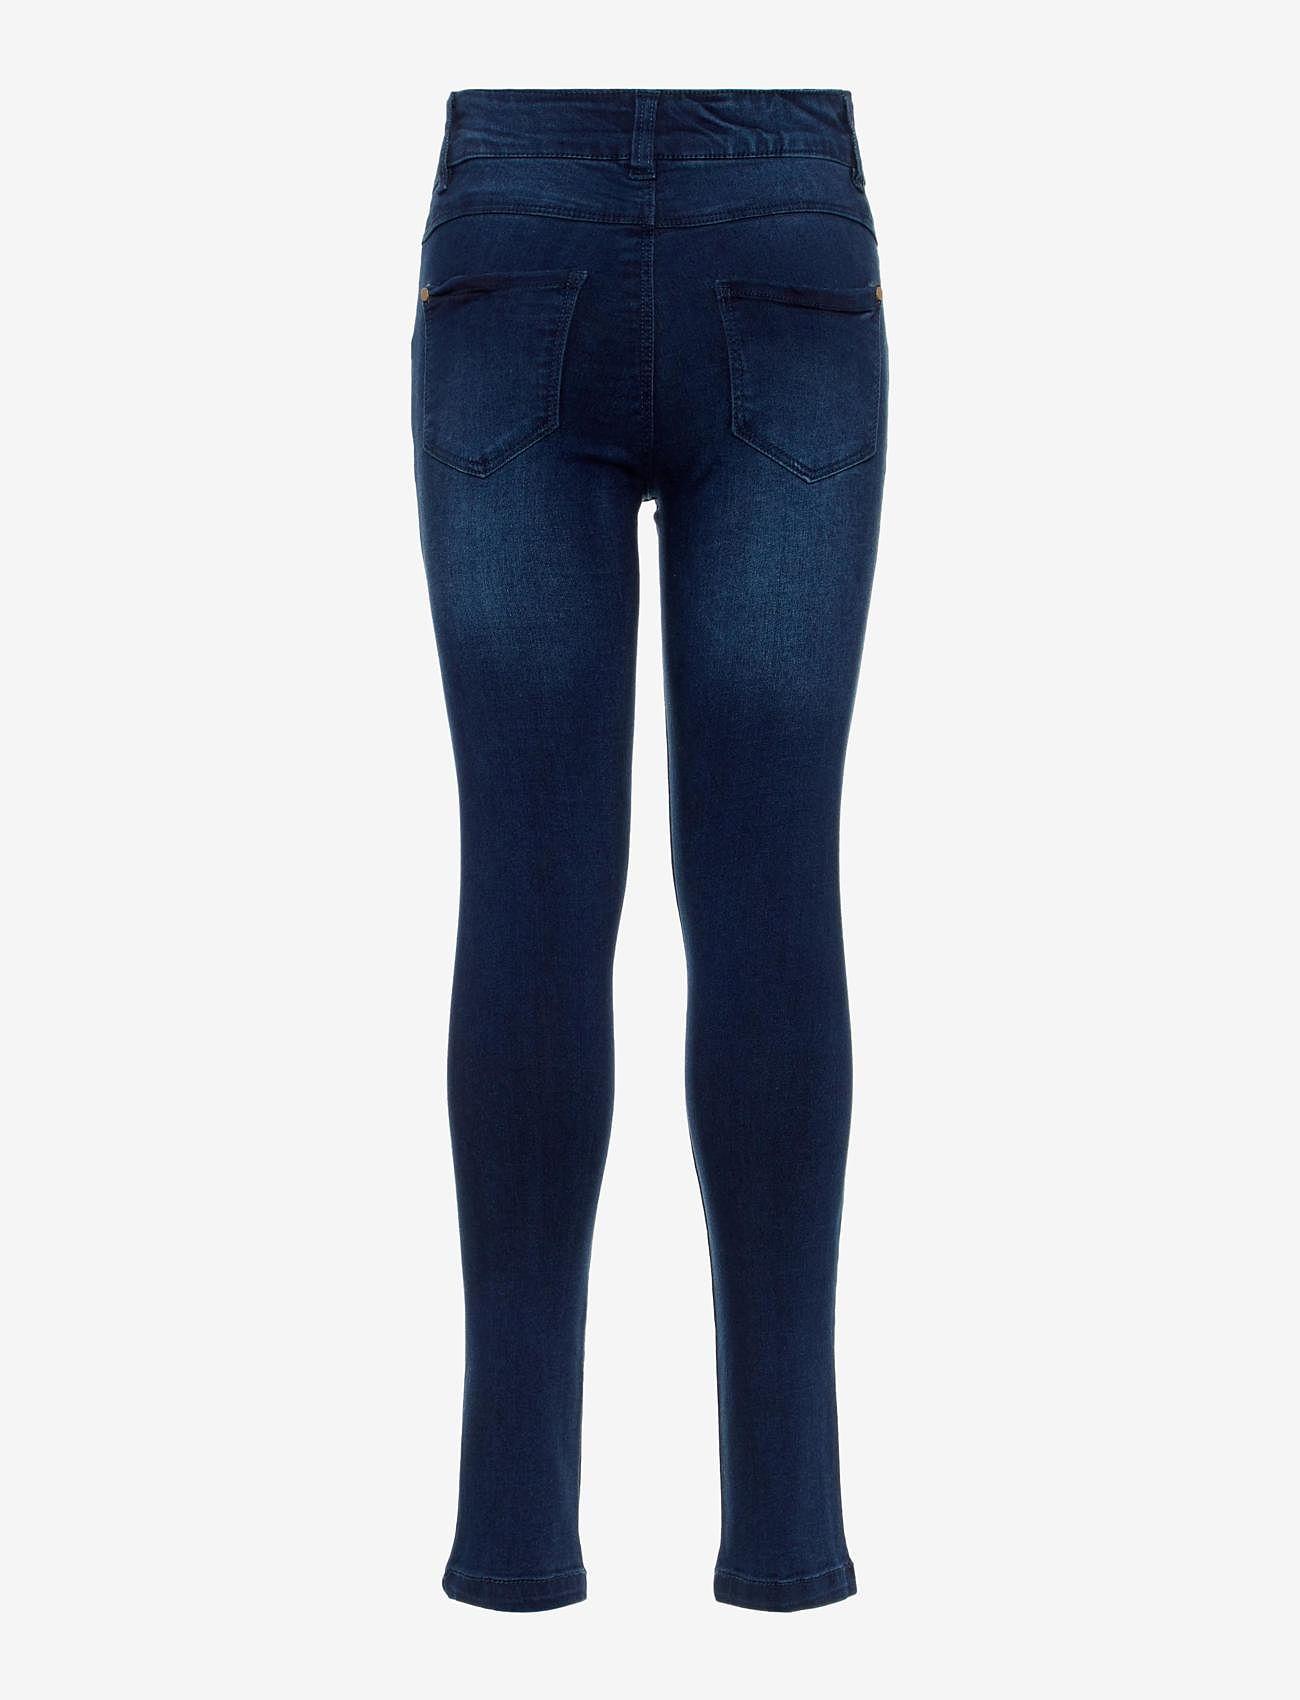 name it - NKFPOLLY DNMTRILLAS 3001 PANT NOOS - jeans - dark blue denim - 1